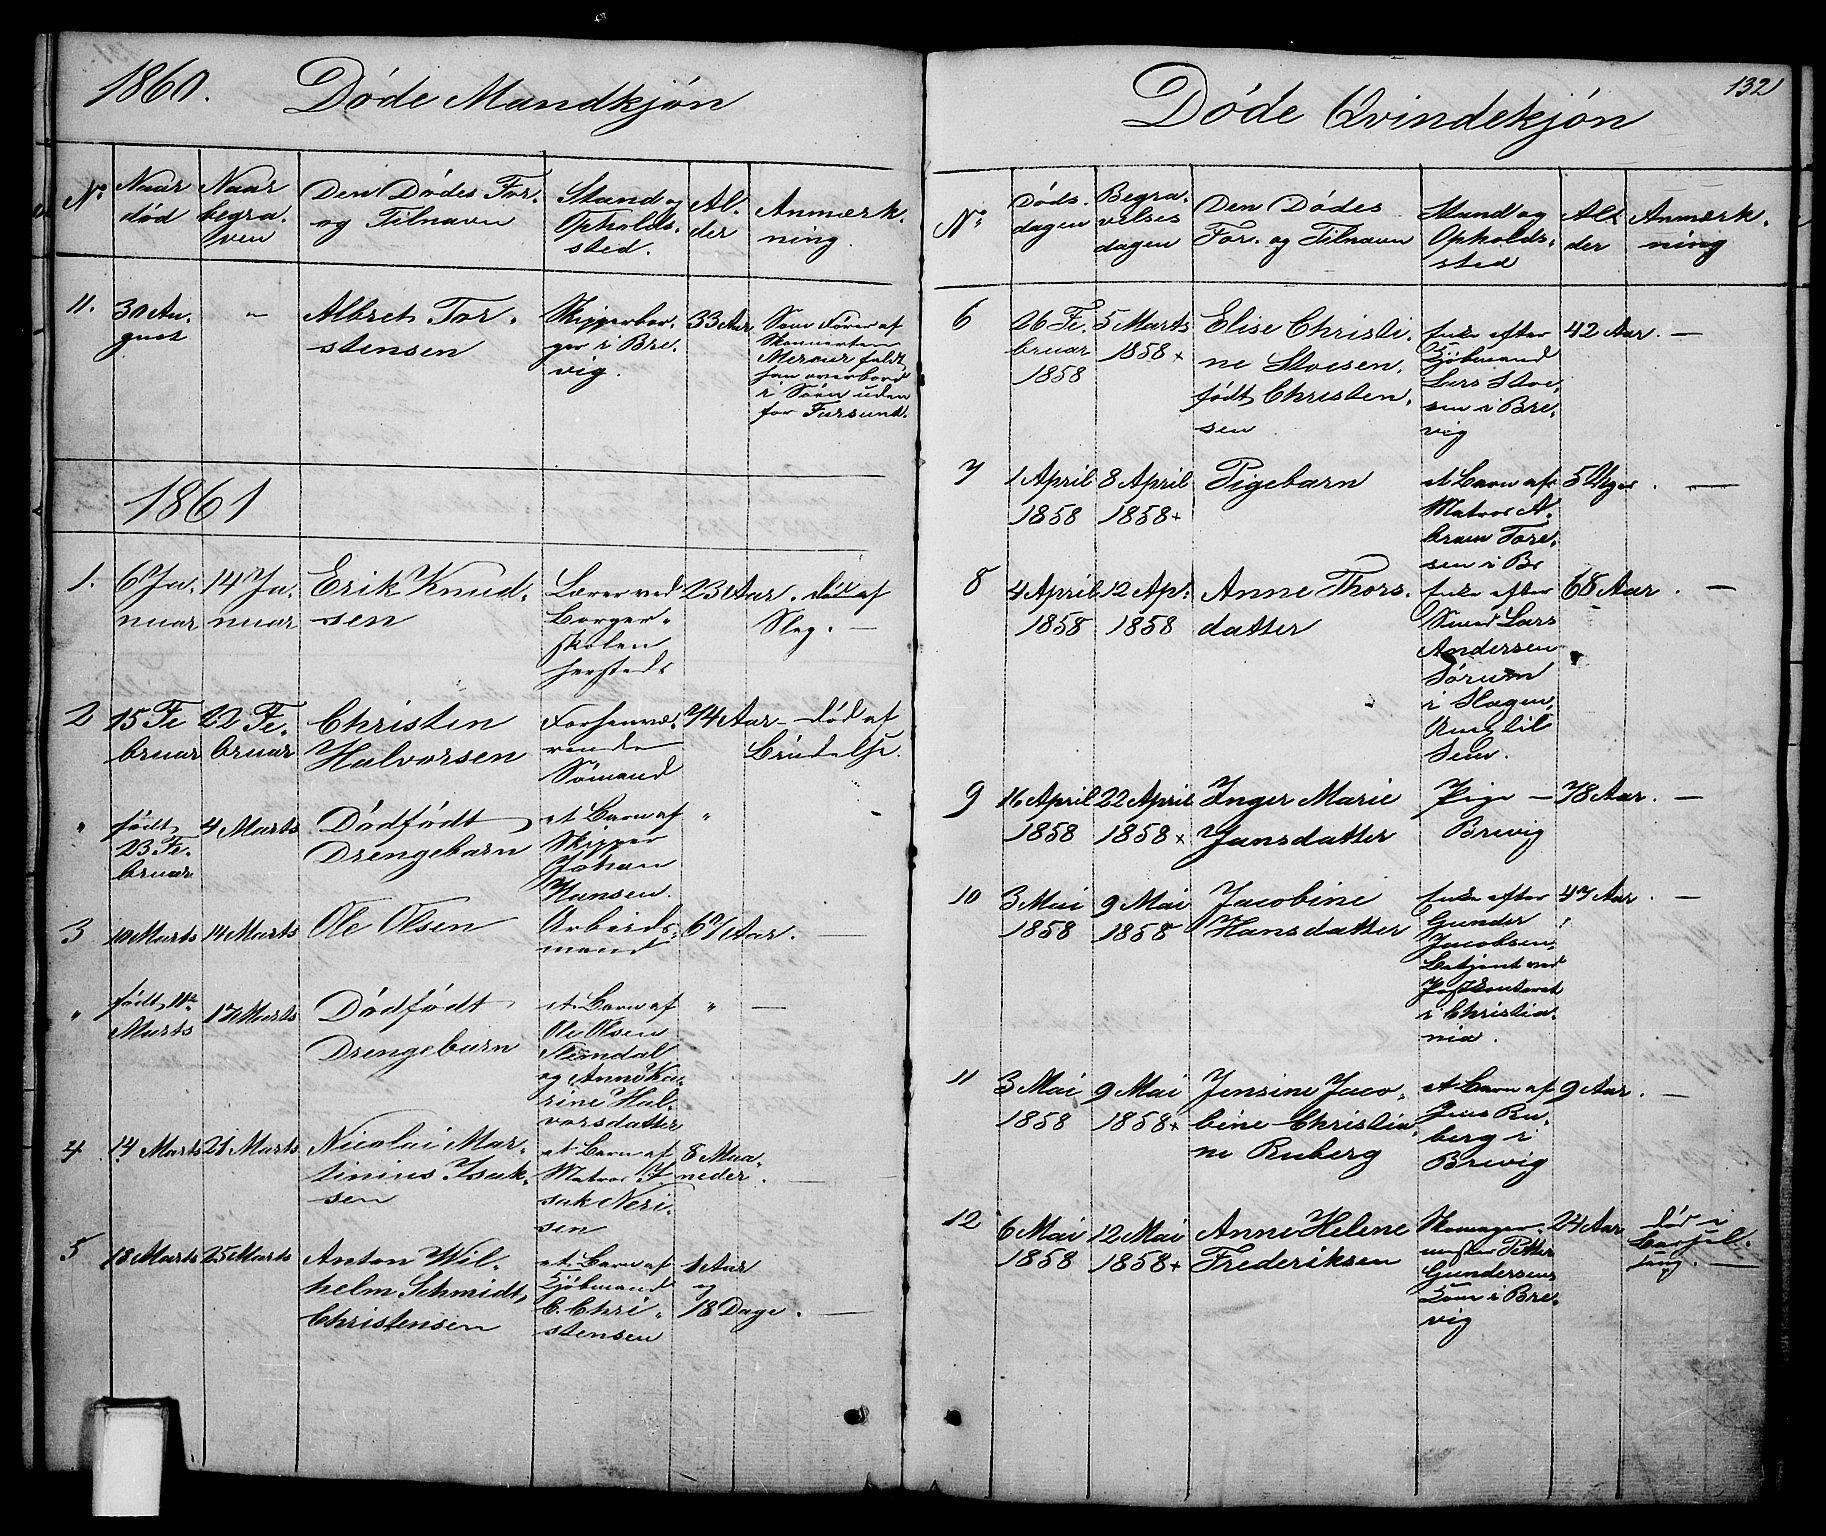 SAKO, Brevik kirkebøker, G/Ga/L0002: Klokkerbok nr. 2, 1846-1865, s. 132